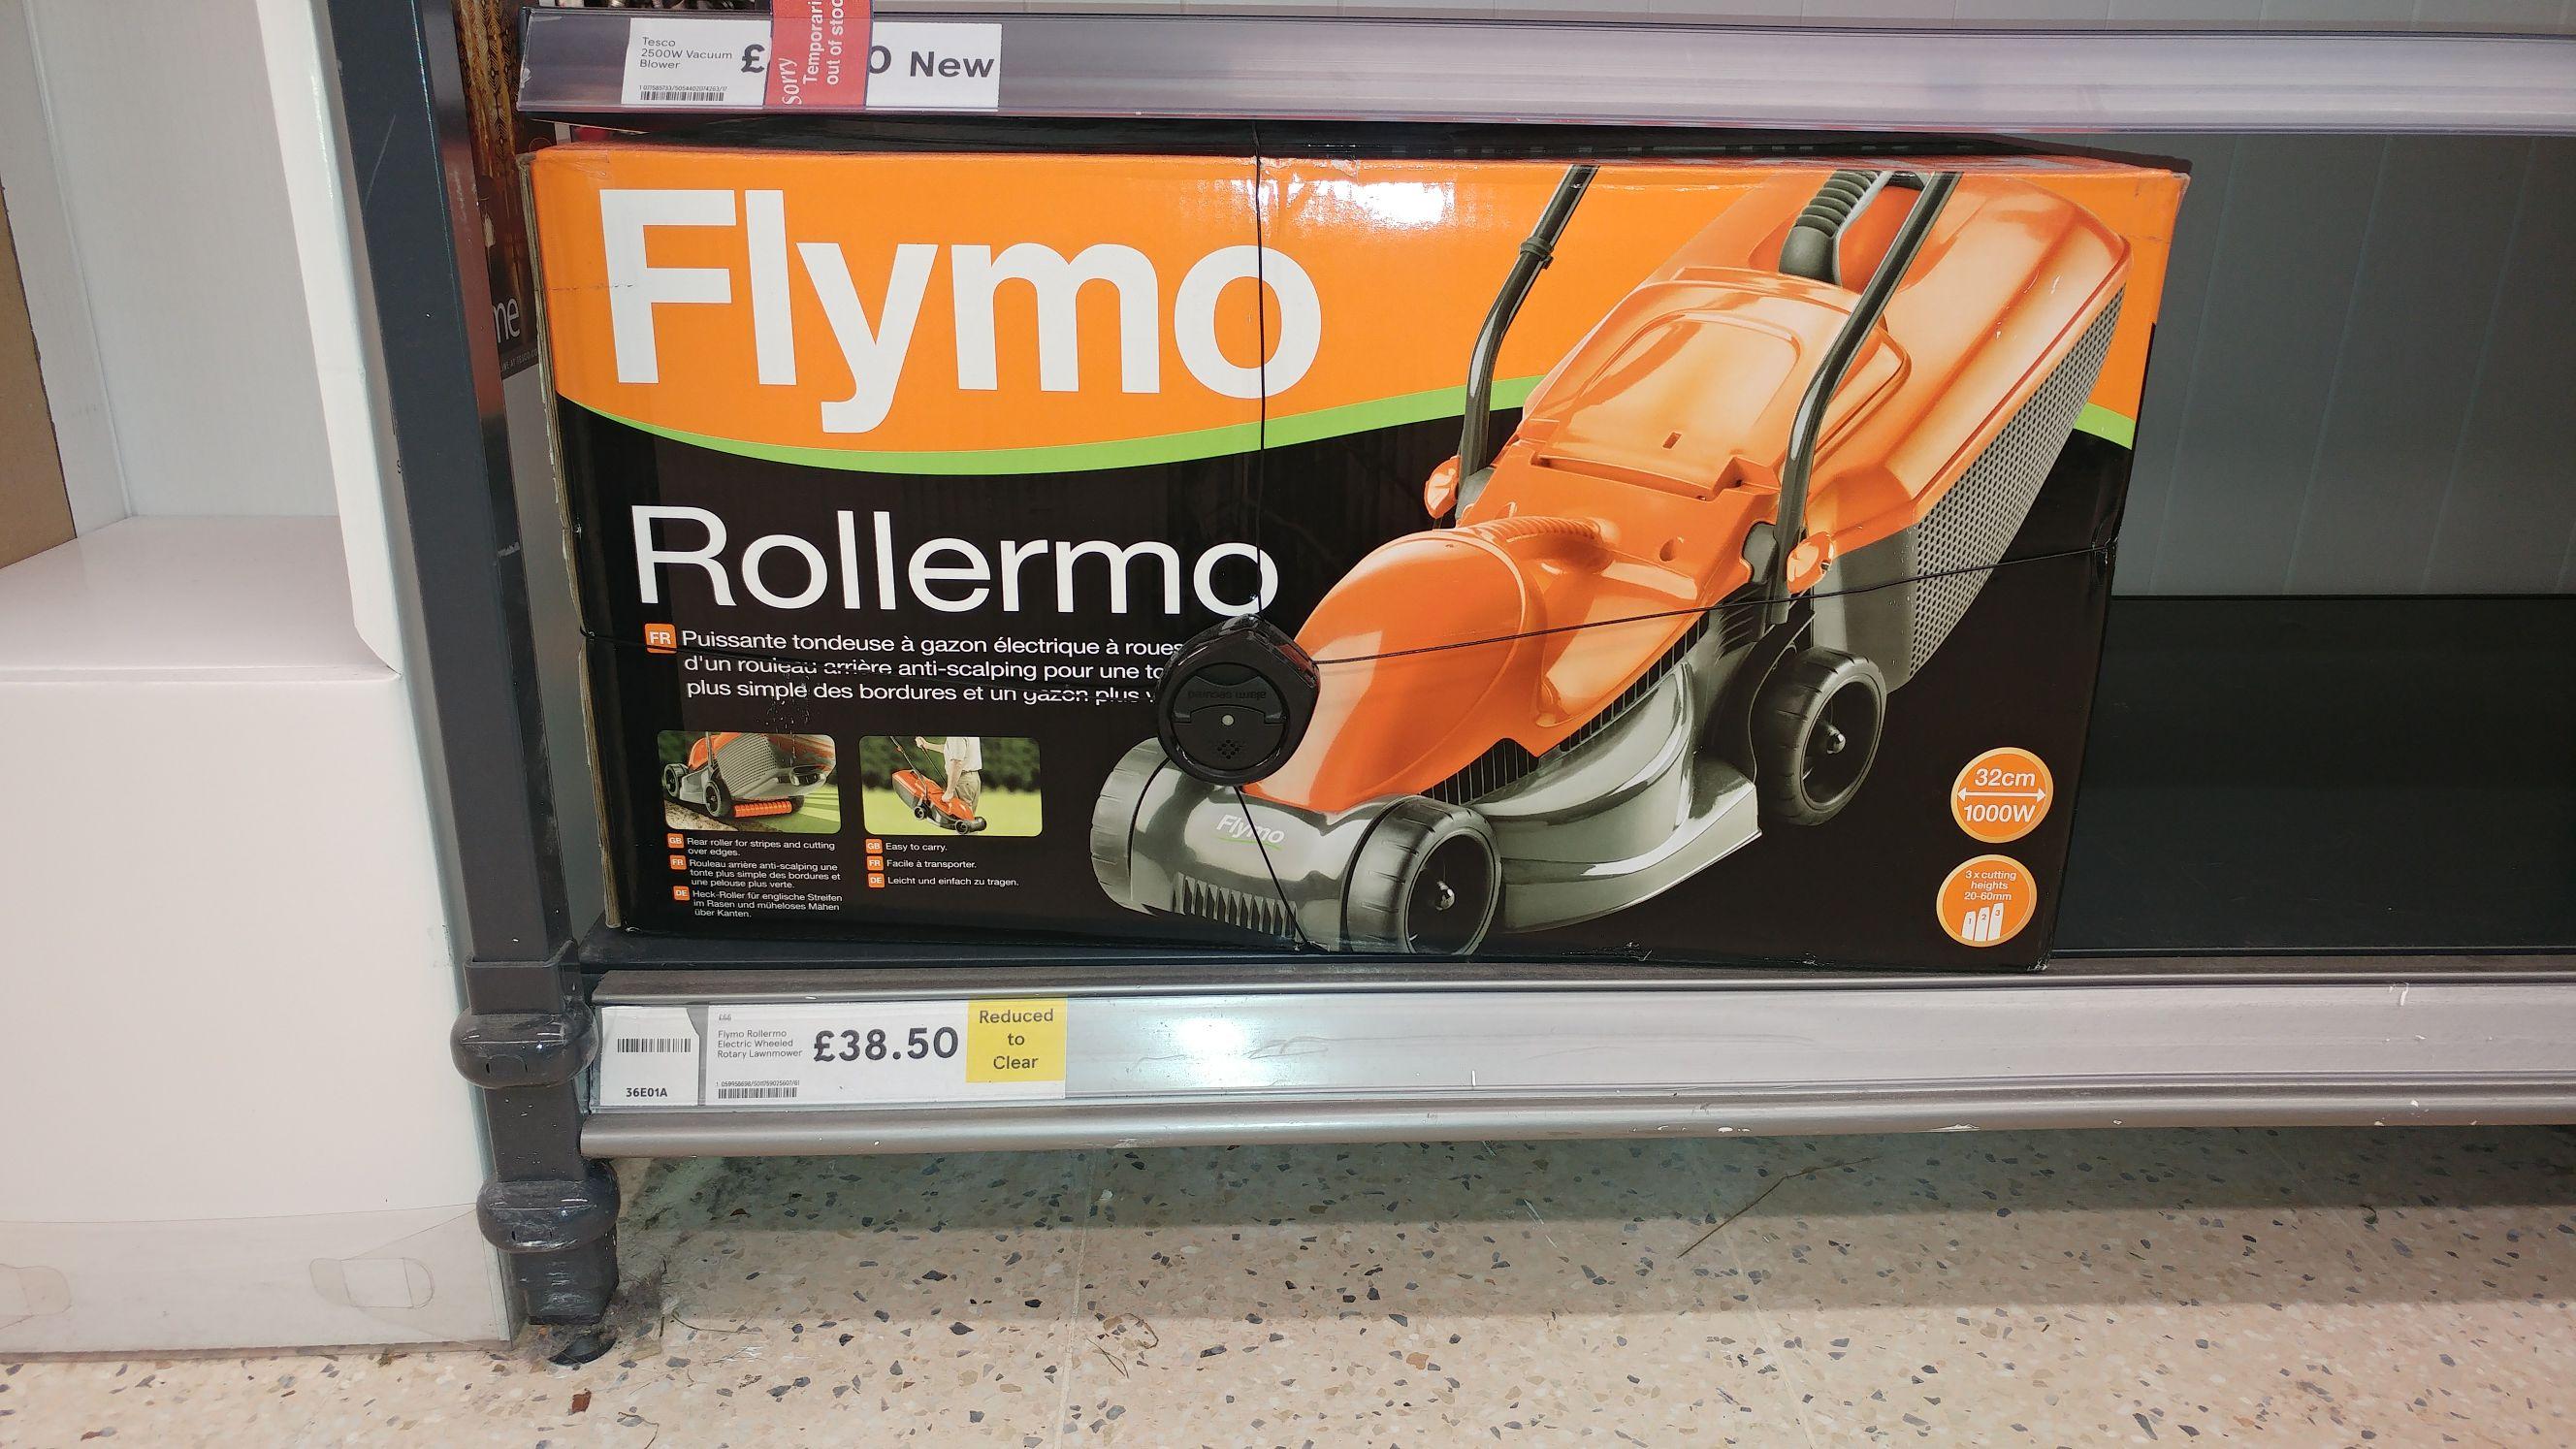 Tesco Flymo Rollermo £38.50 instore @ Tesco - Winchester